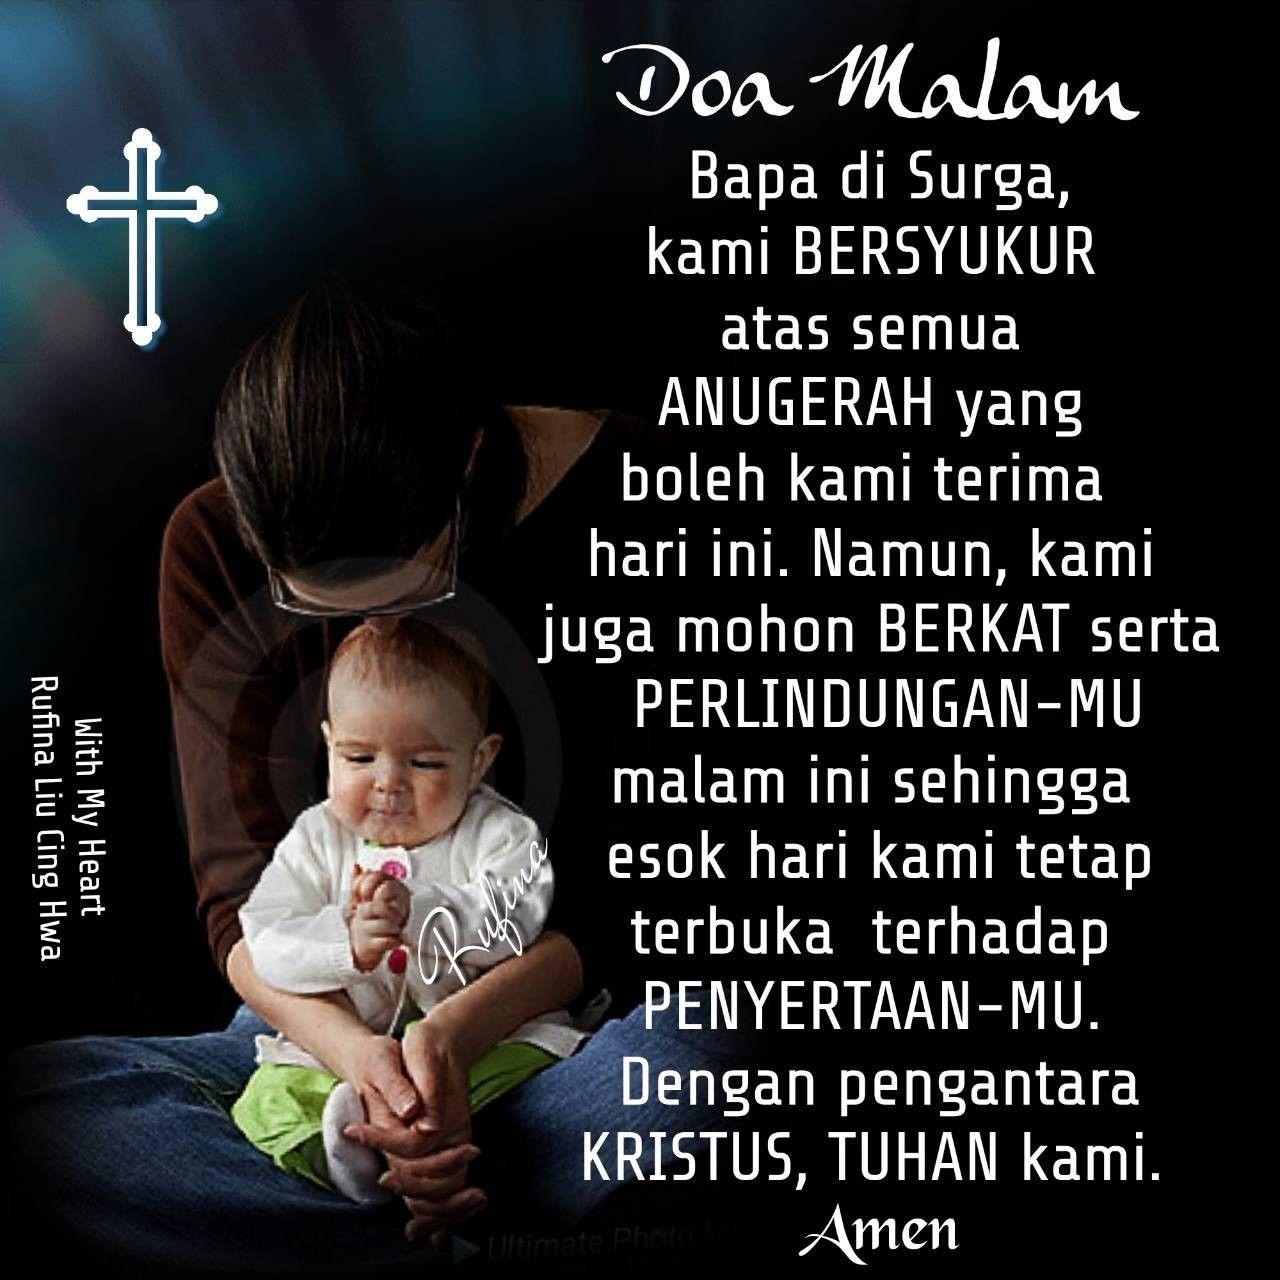 With My Heart Good Night Gbu Mazmur 121 4 Sesungguhnya Tidak Terlela Mazmur 121 Doa Katolik Kutipan Kristen